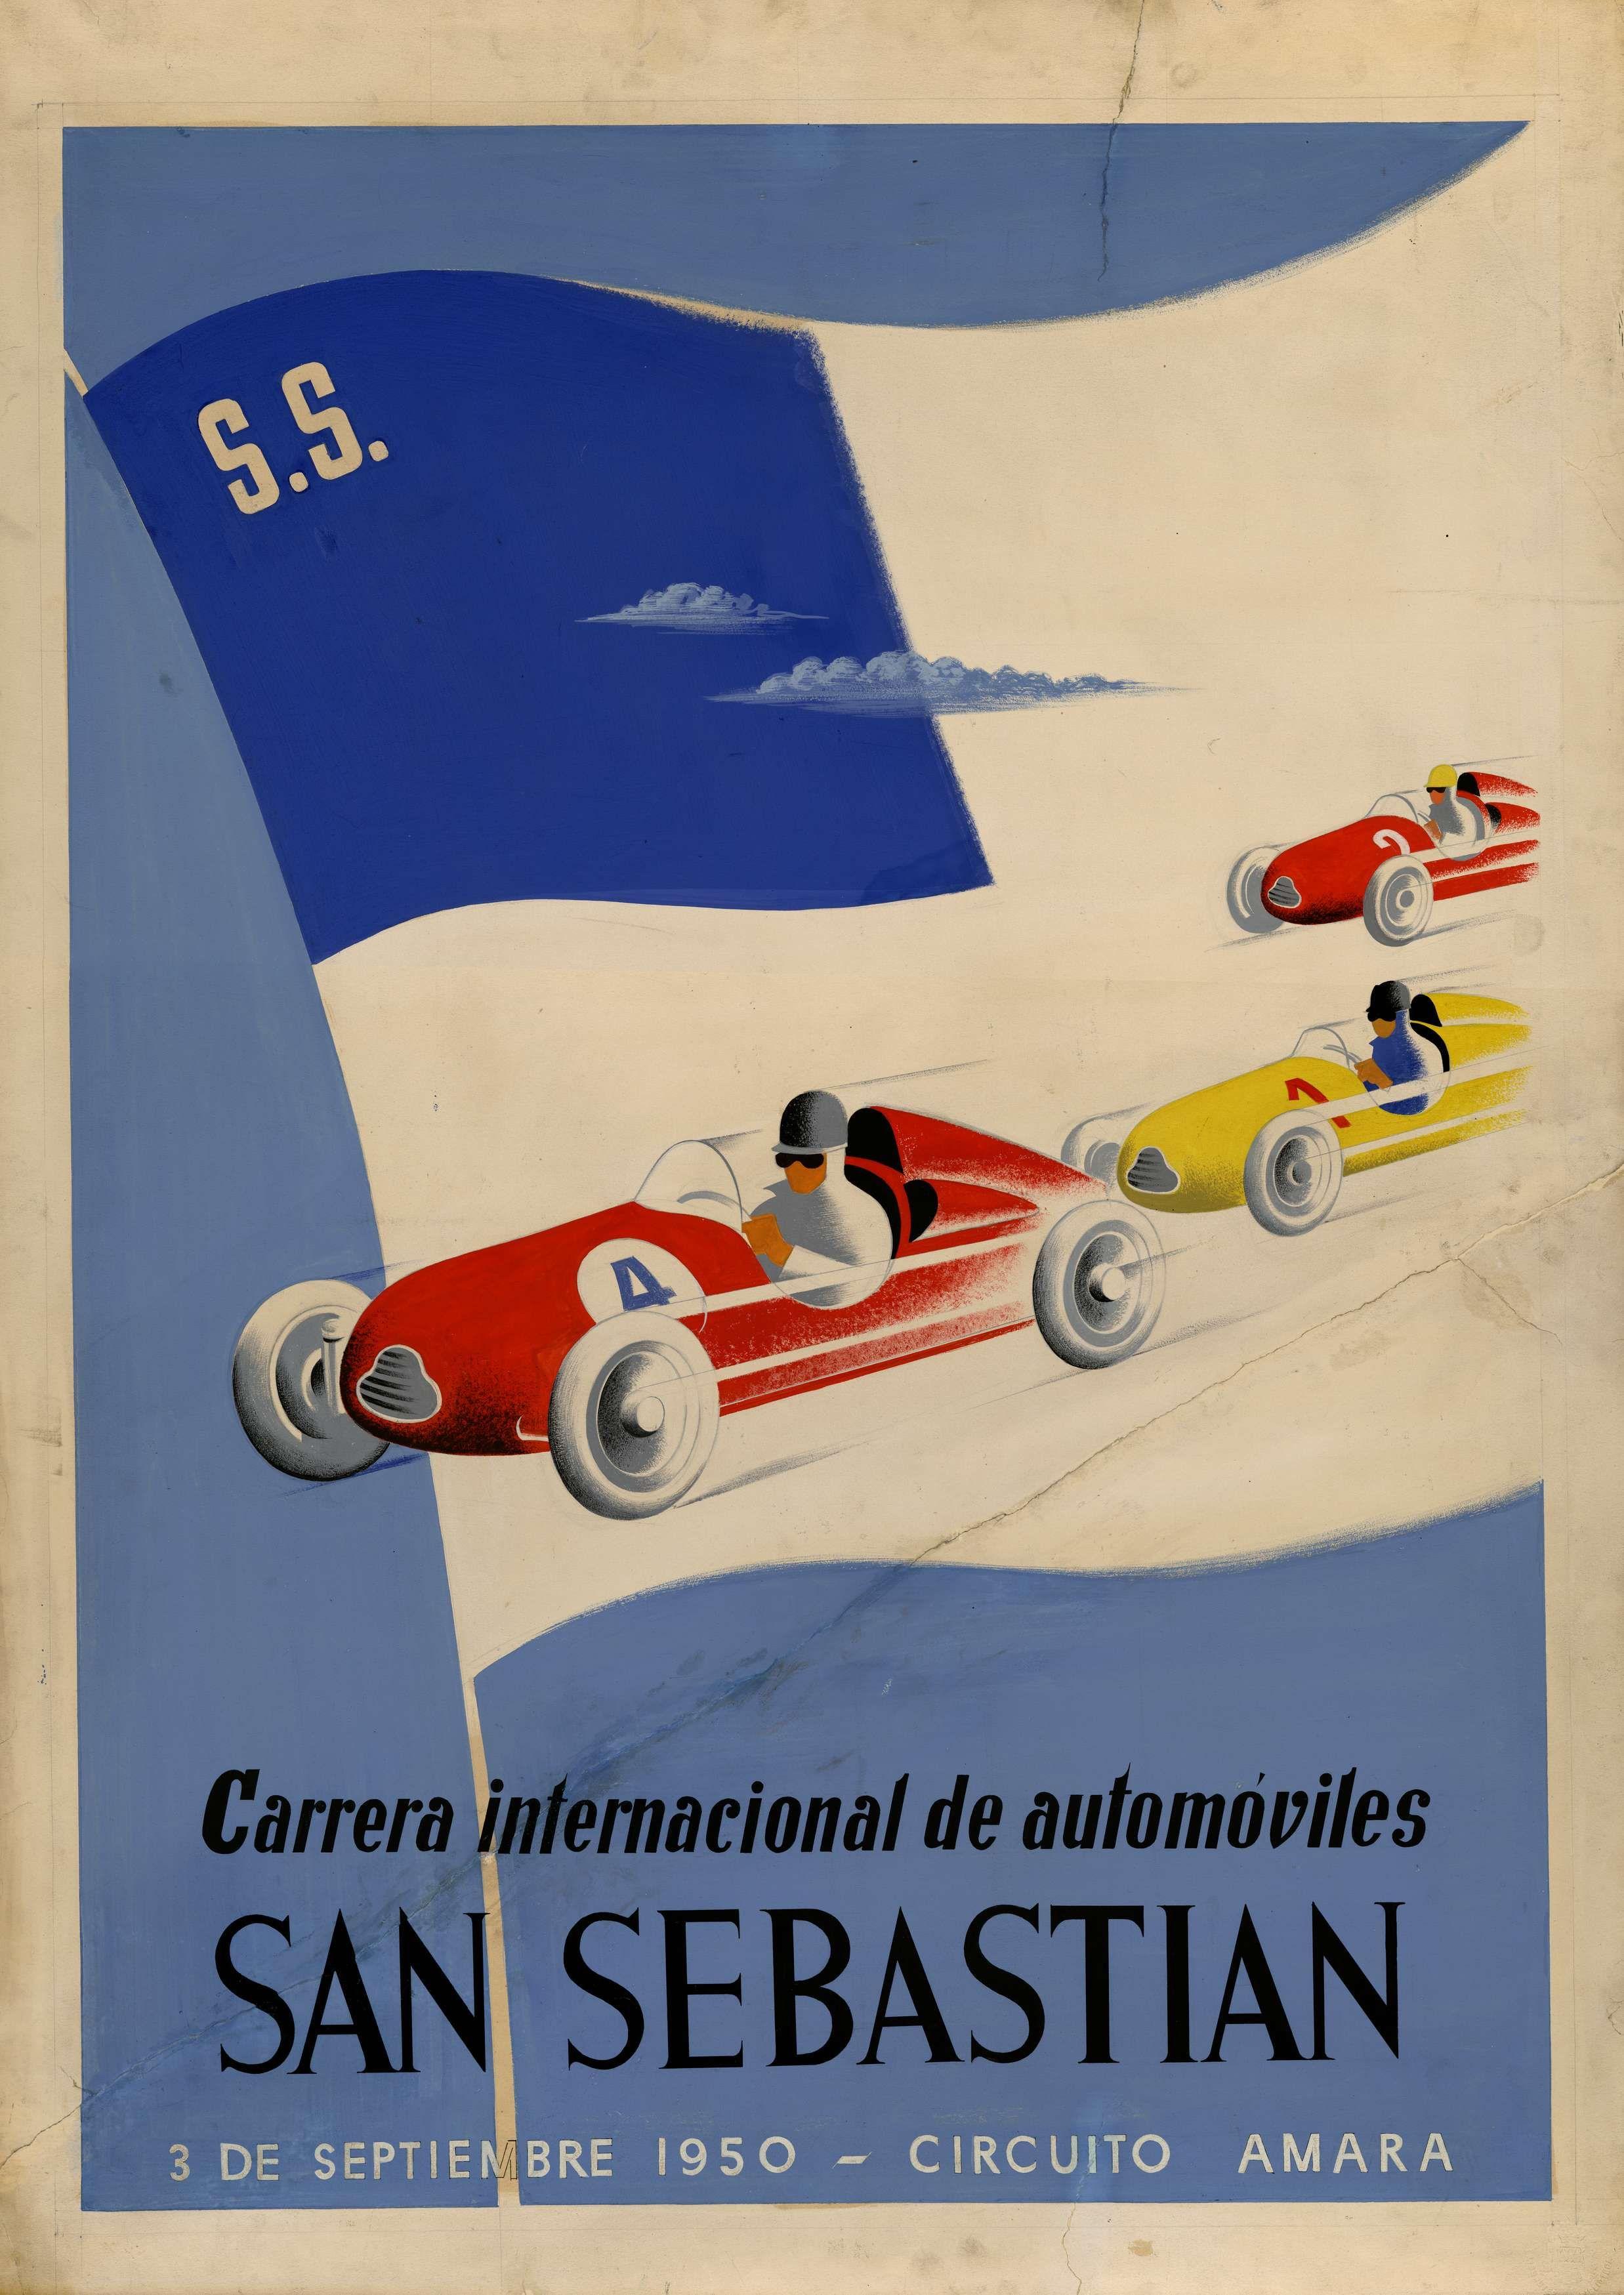 San Sebastian Spain 1950 Carreras San Sebastian Circuito